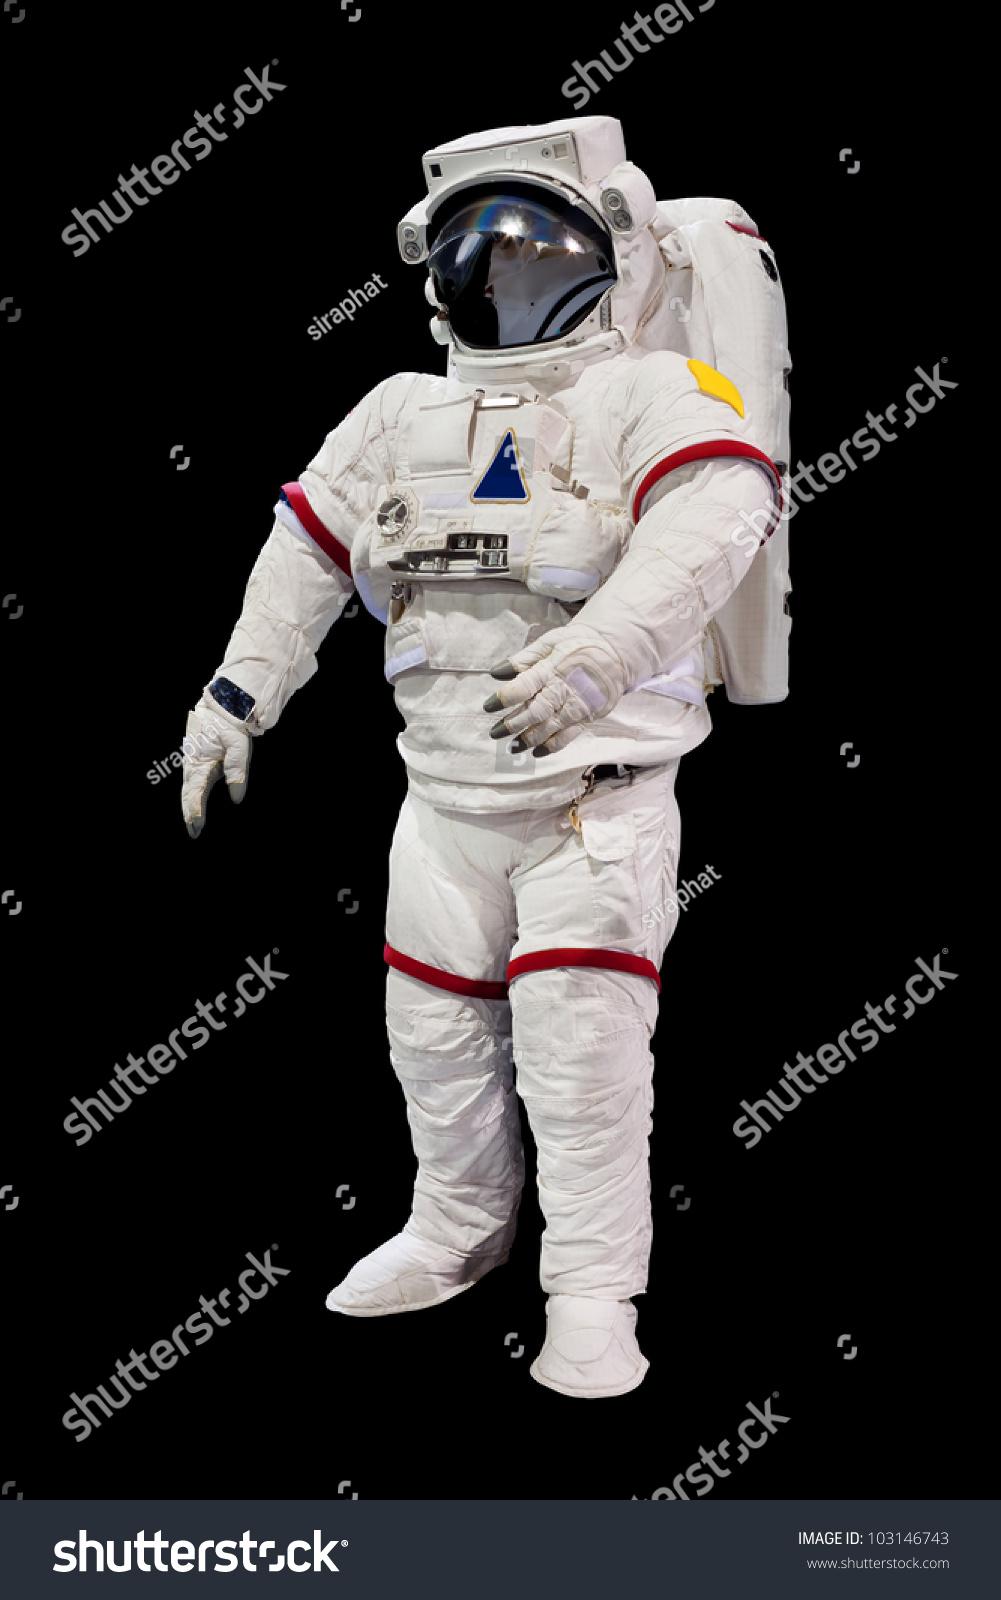 astronaut black background - photo #6